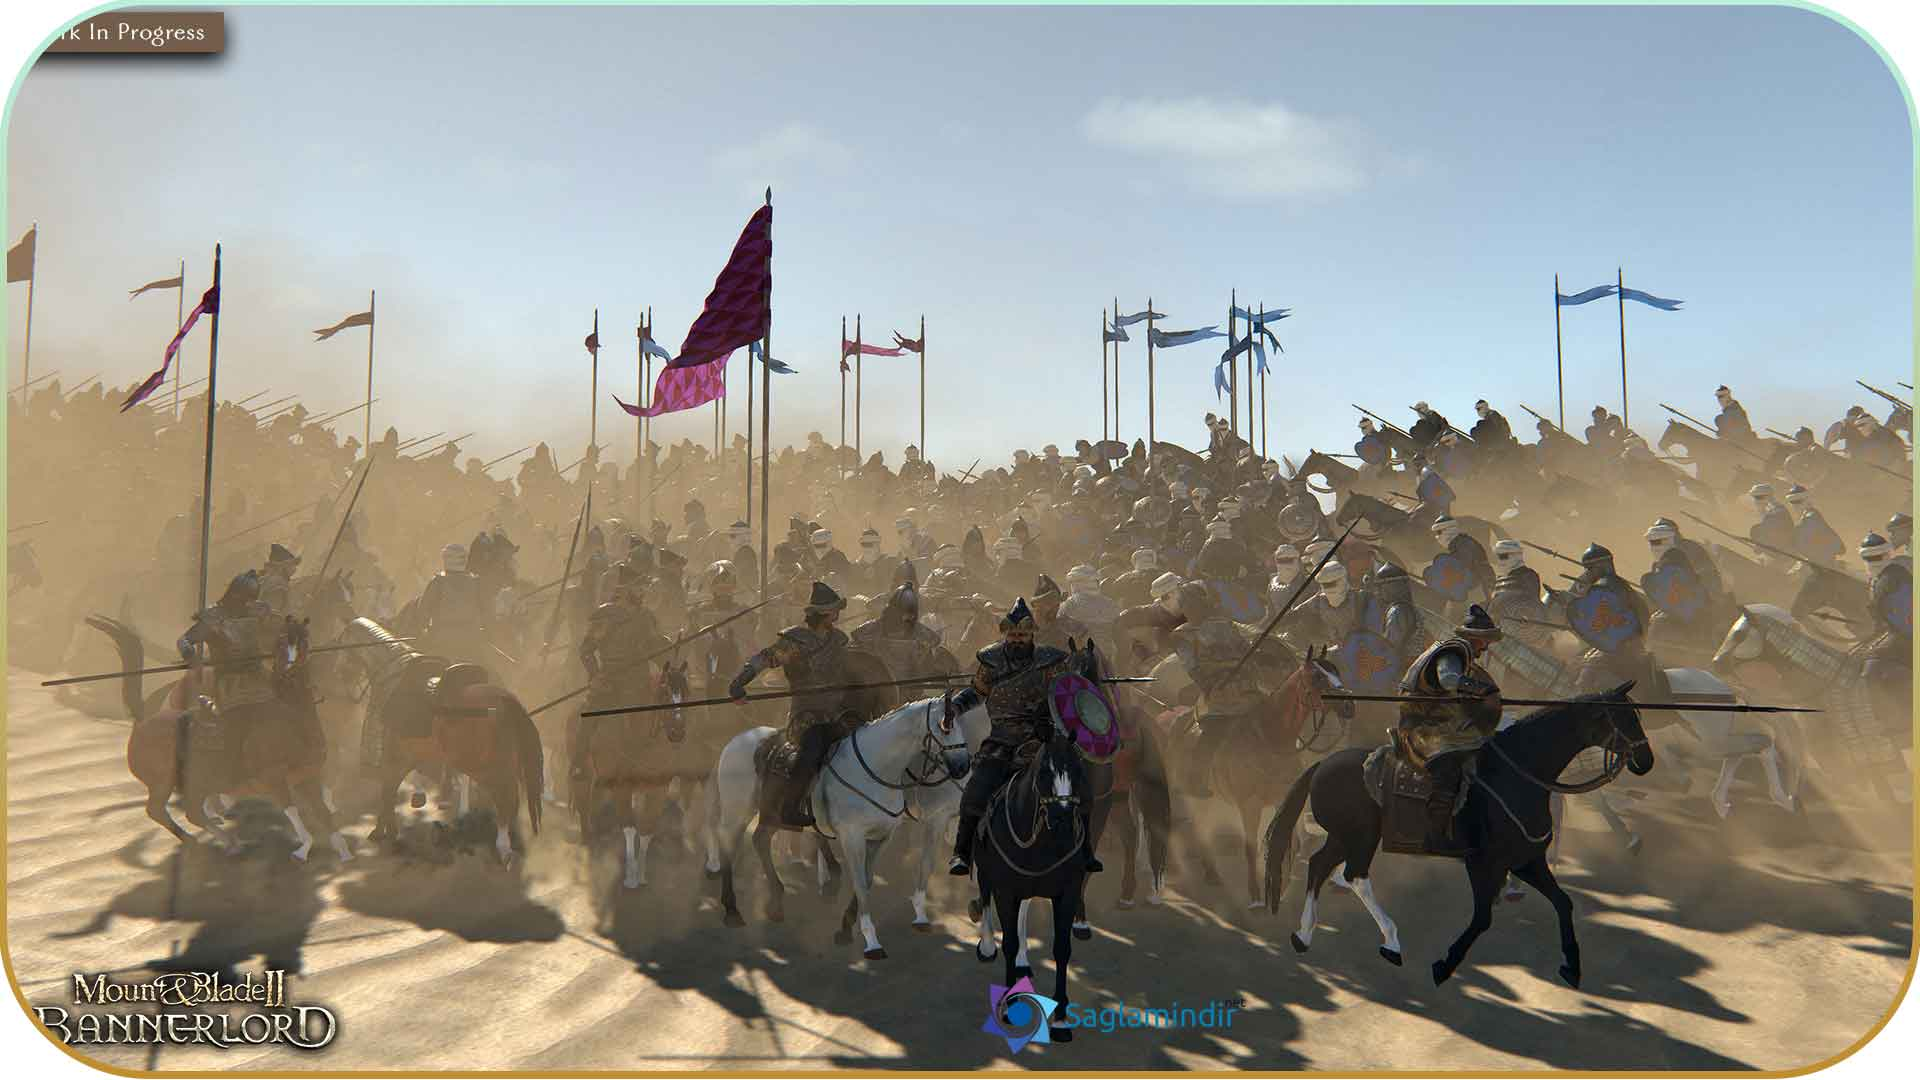 Mount & Blade II: Bannerlord saglamindir